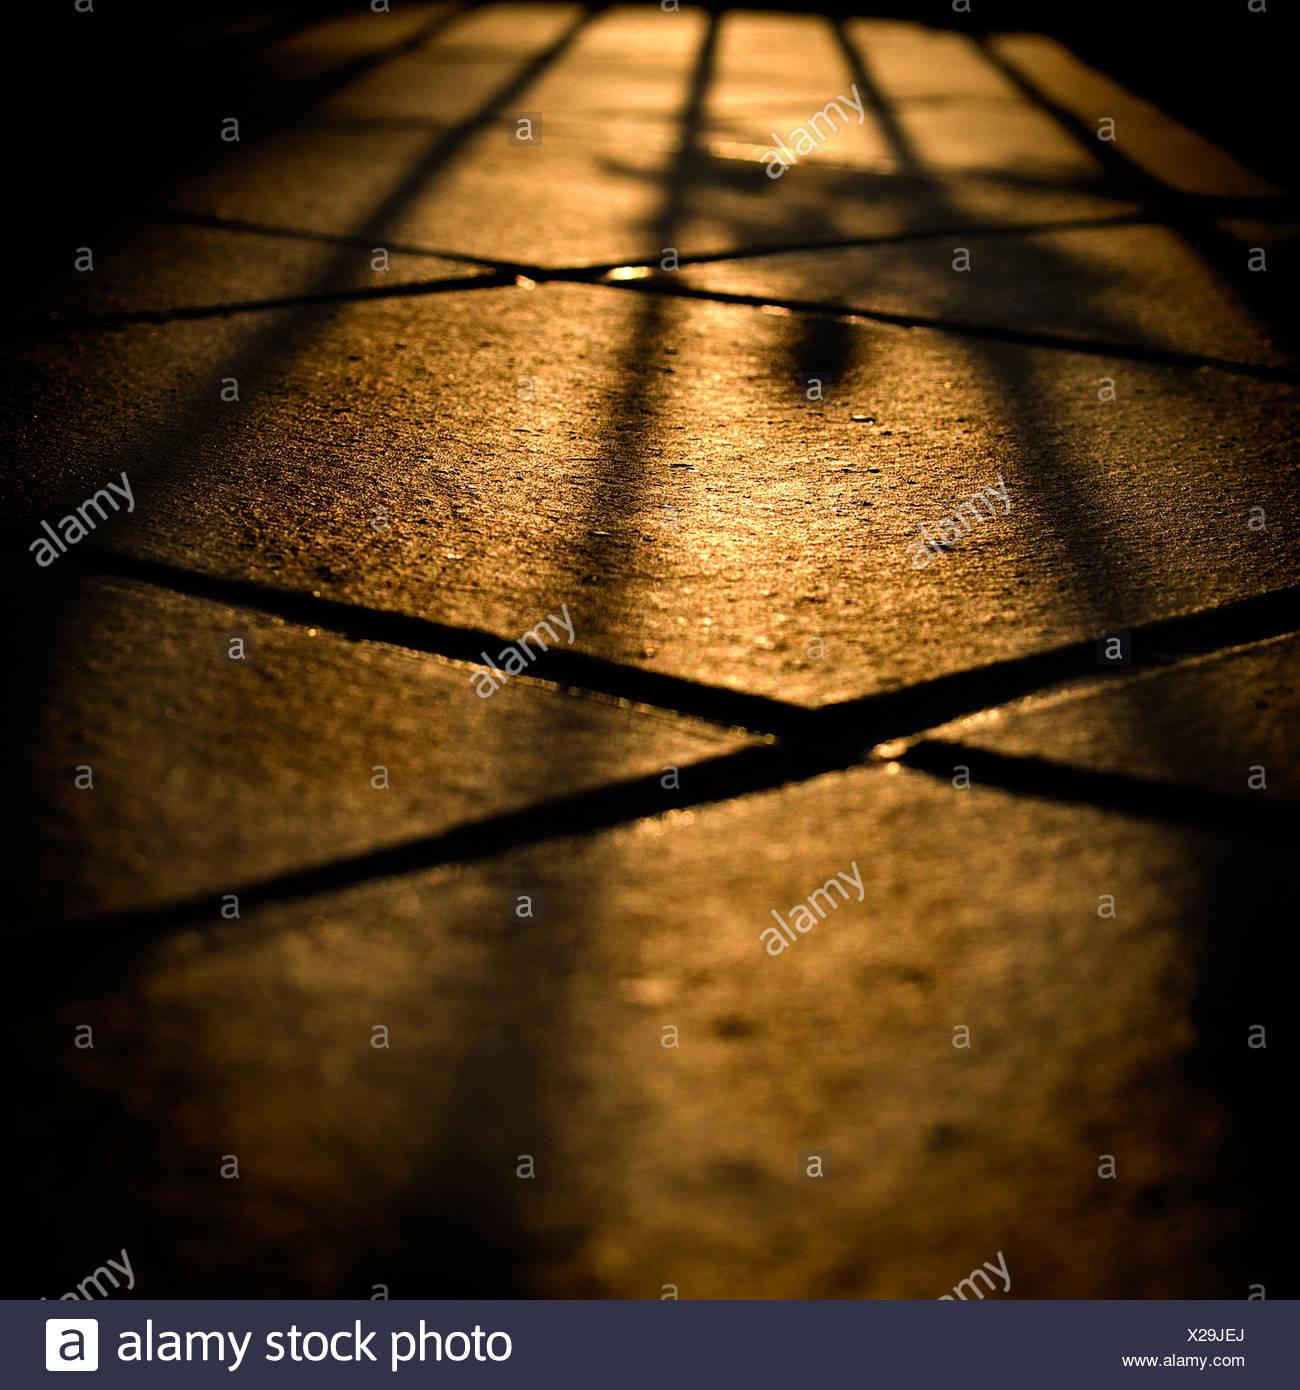 Shadows on floor tiles - Stock Image